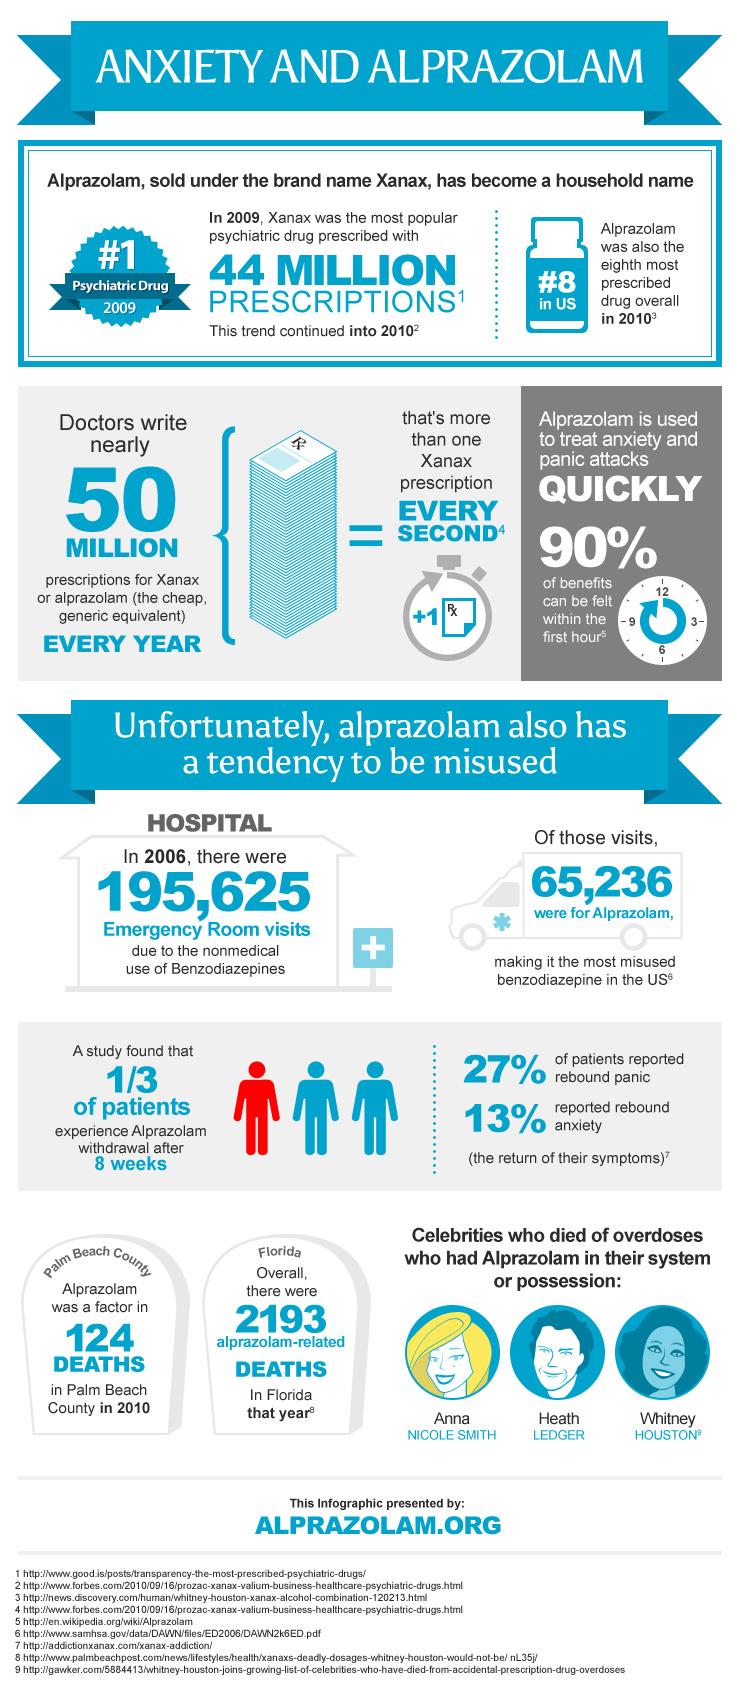 xanax alprazolam medication side effects